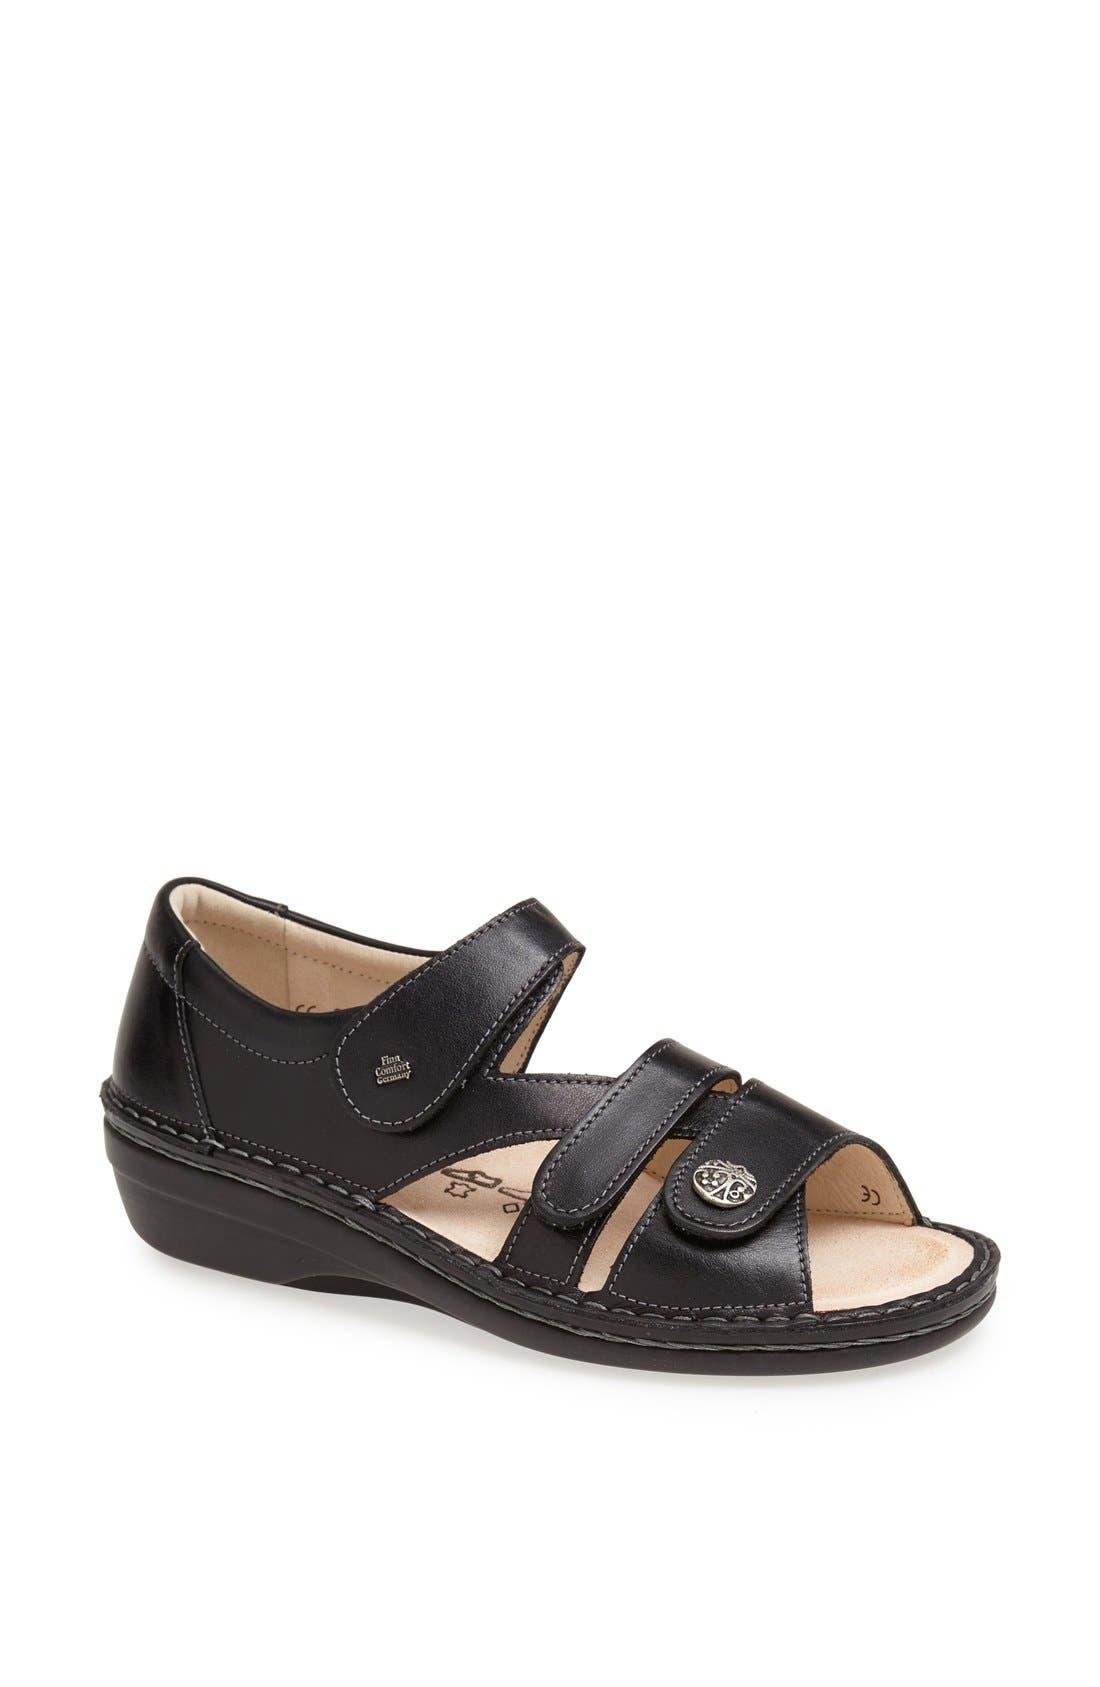 Finn Comfort 'Sintra' Sandal